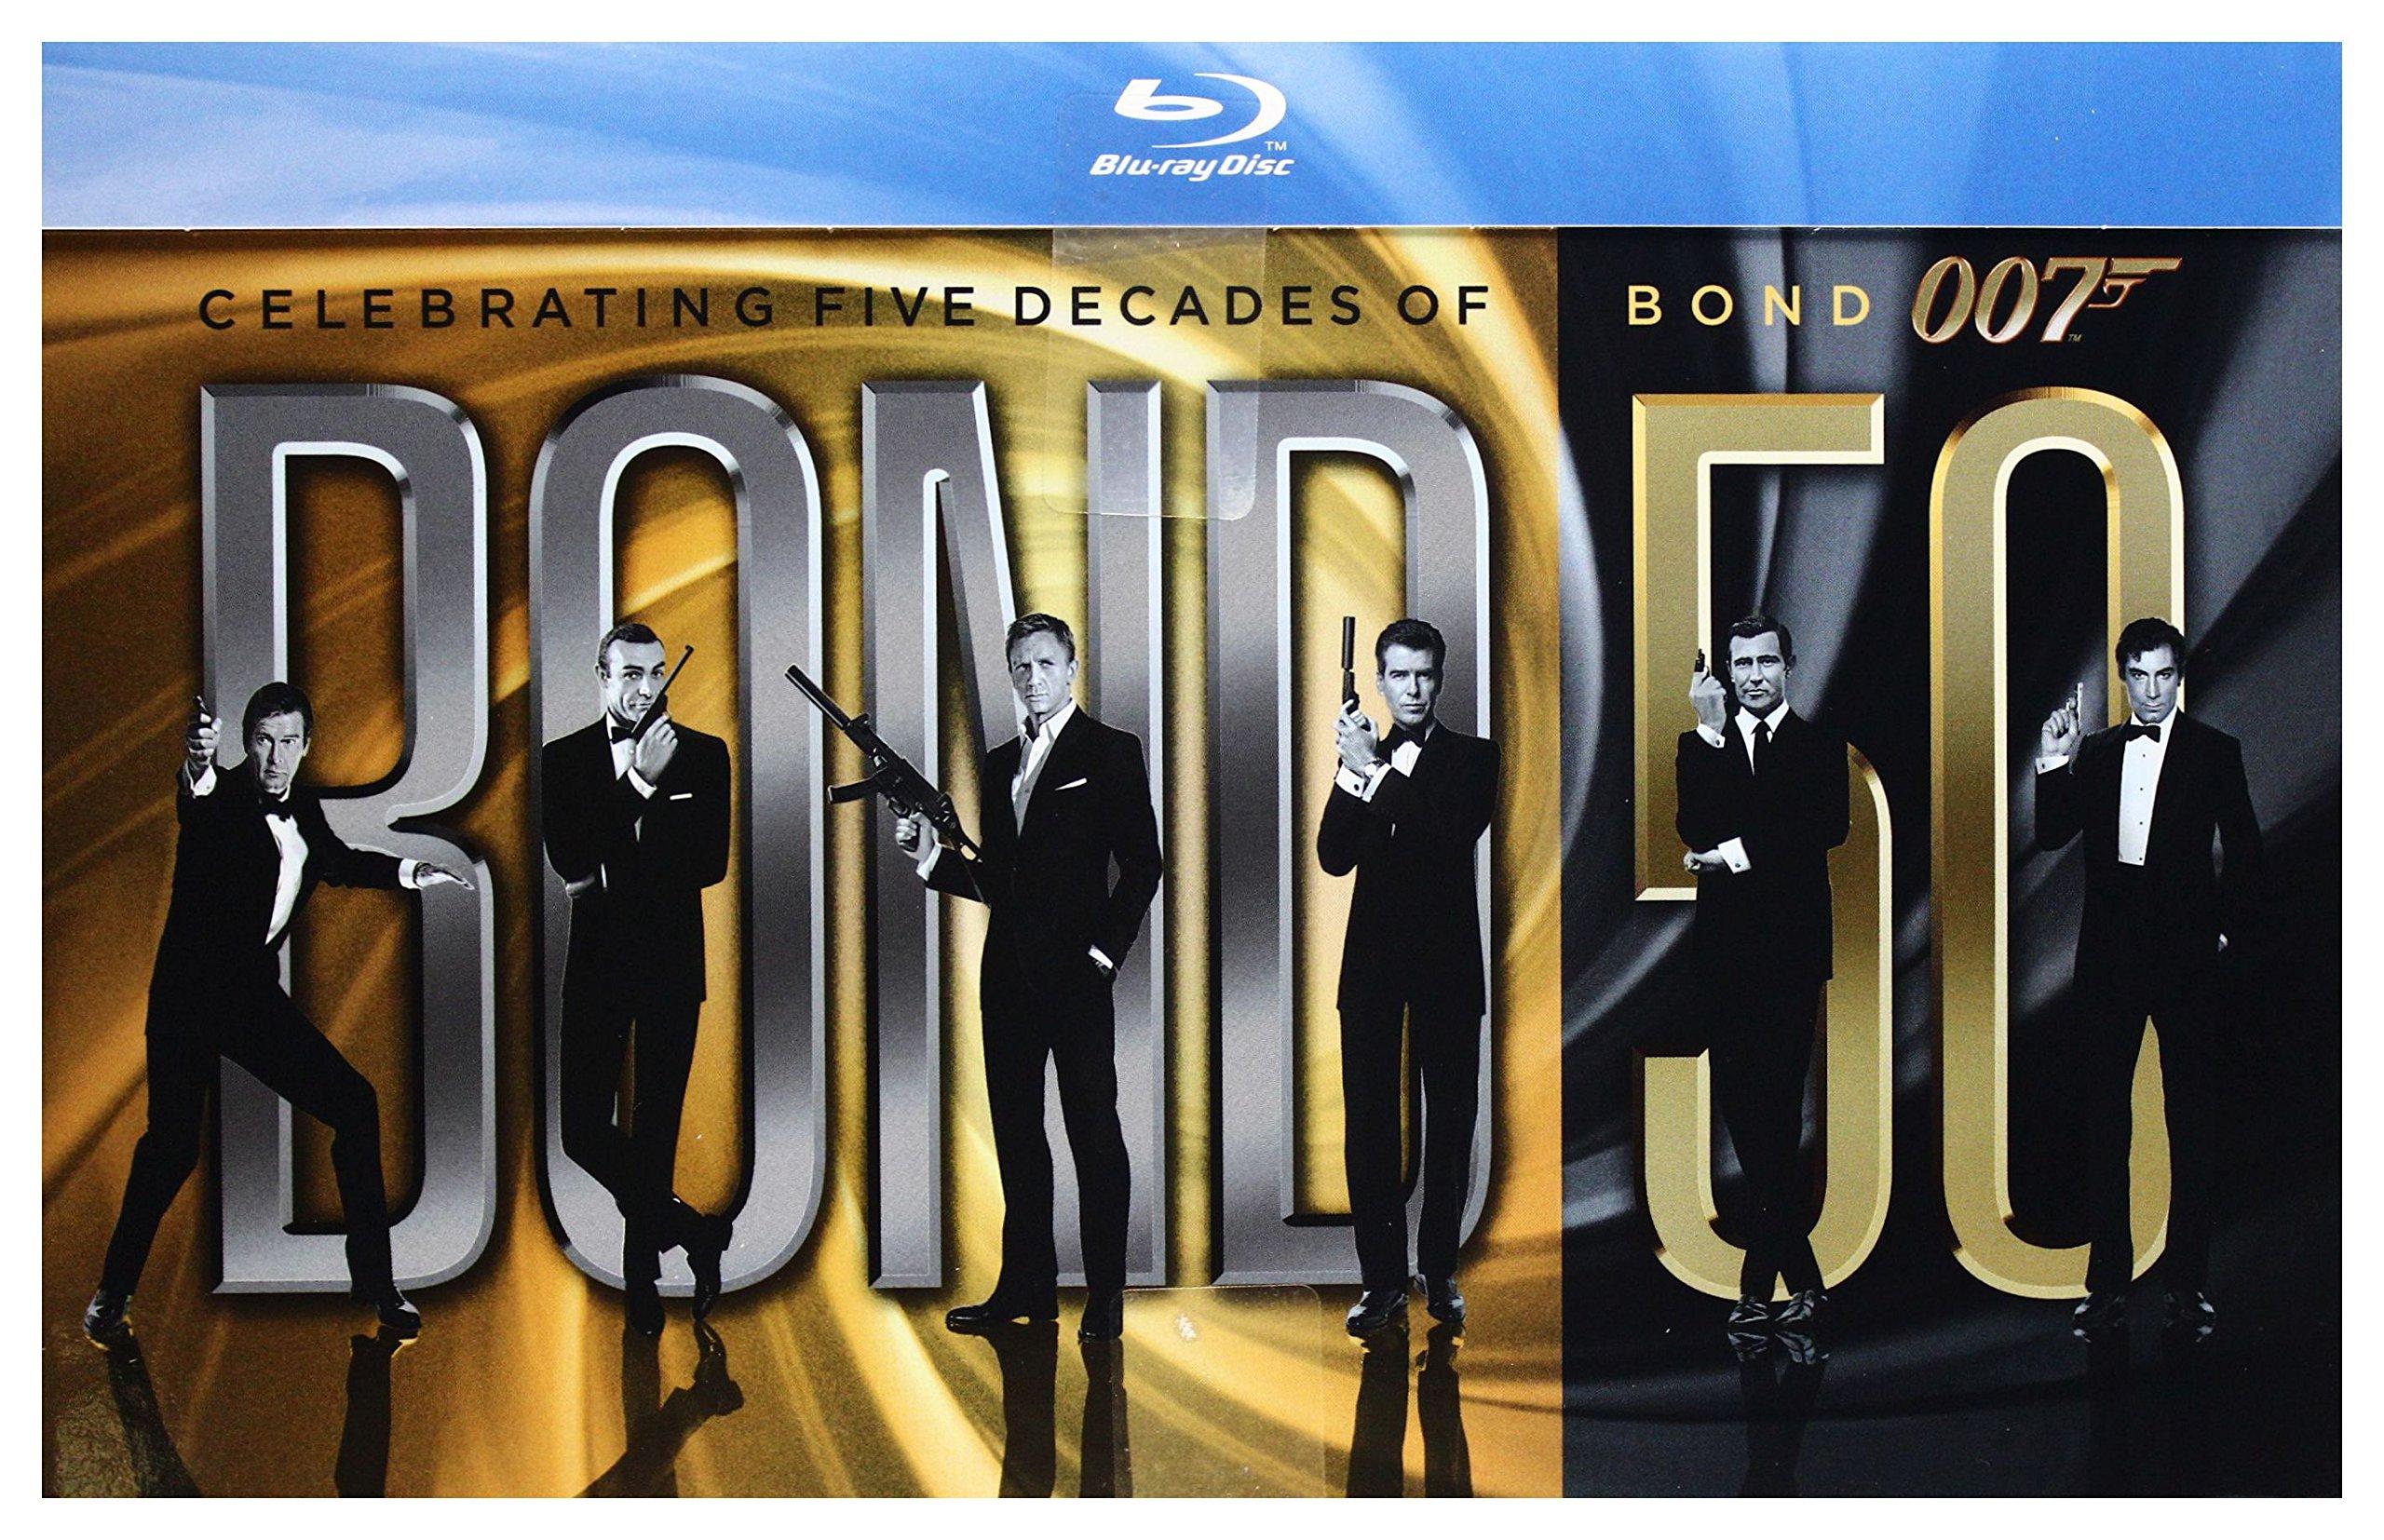 007 James Bond: Pełna Kolekcja 22 filmy [BOX] [23xBlu-Ray] (No English version)